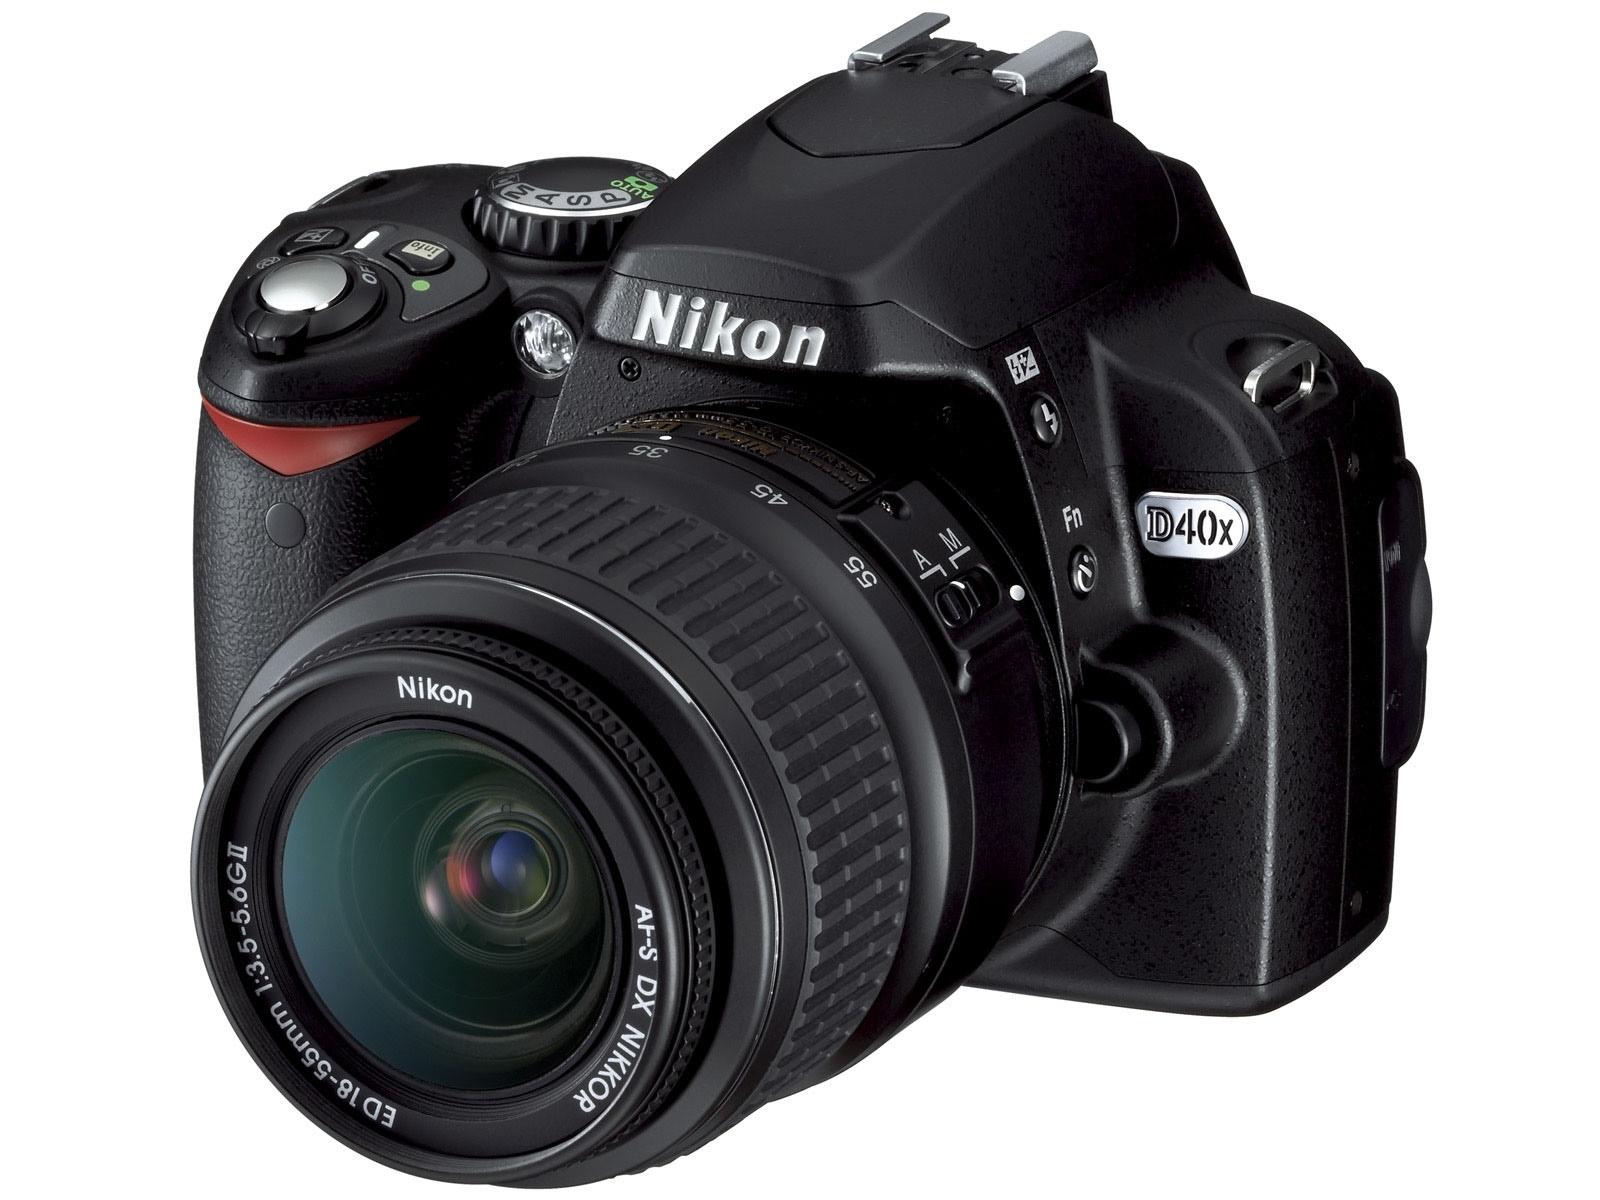 nikon cameras camera nice d40x dslr digital d40 photographers entry level photographer d60 replaced